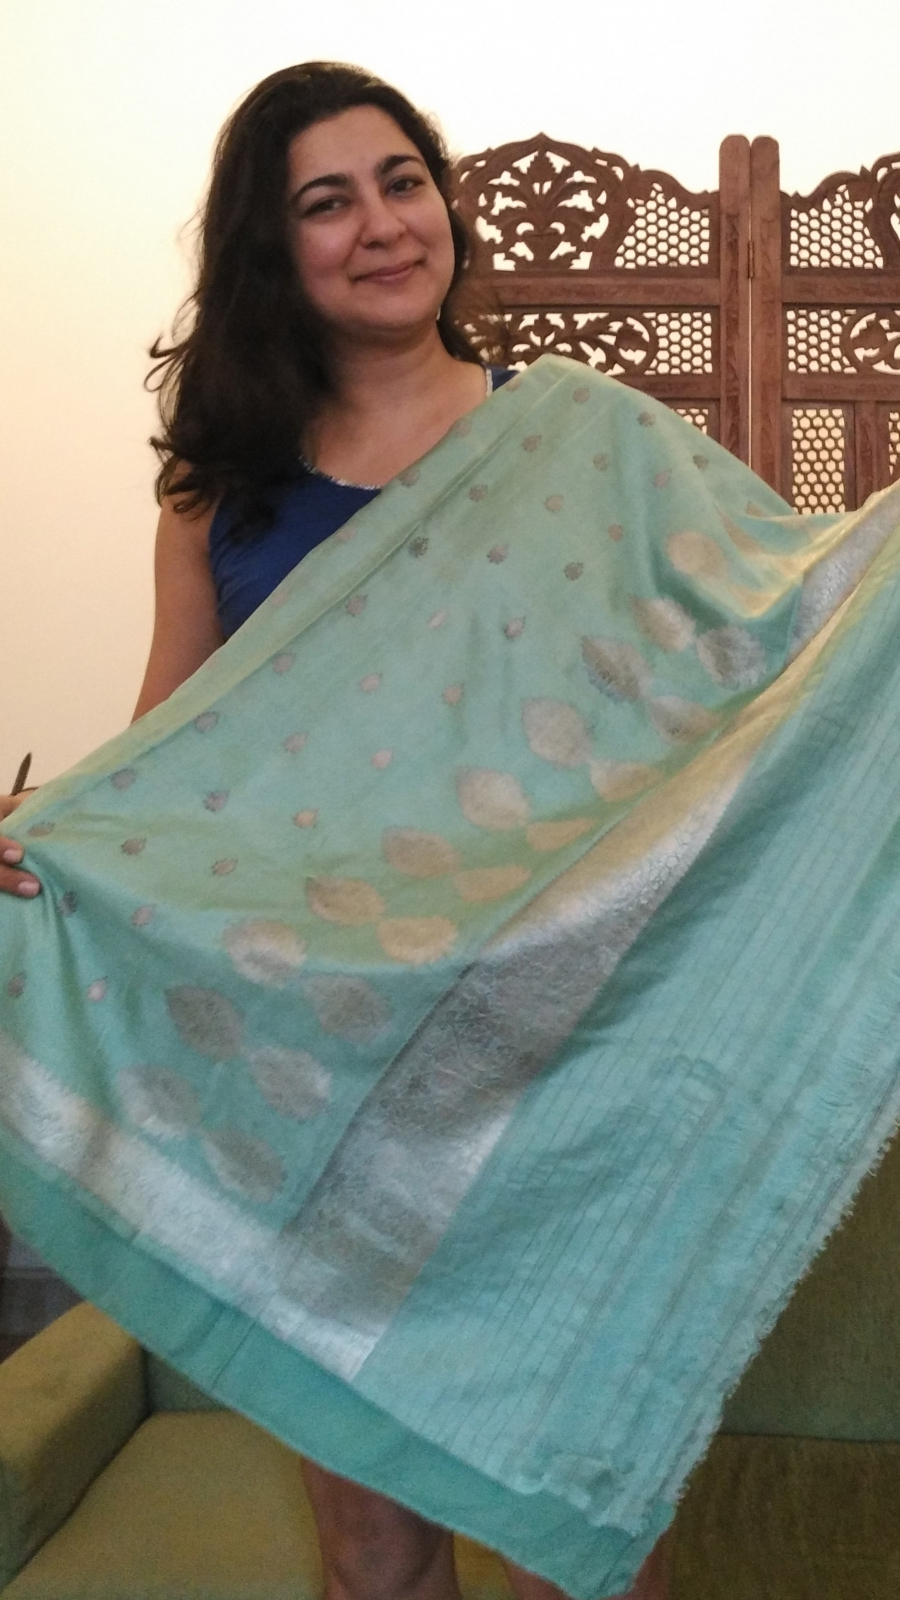 Chhavi Sachdev treasures her grandmother's sari -- but she wouldn't wear it